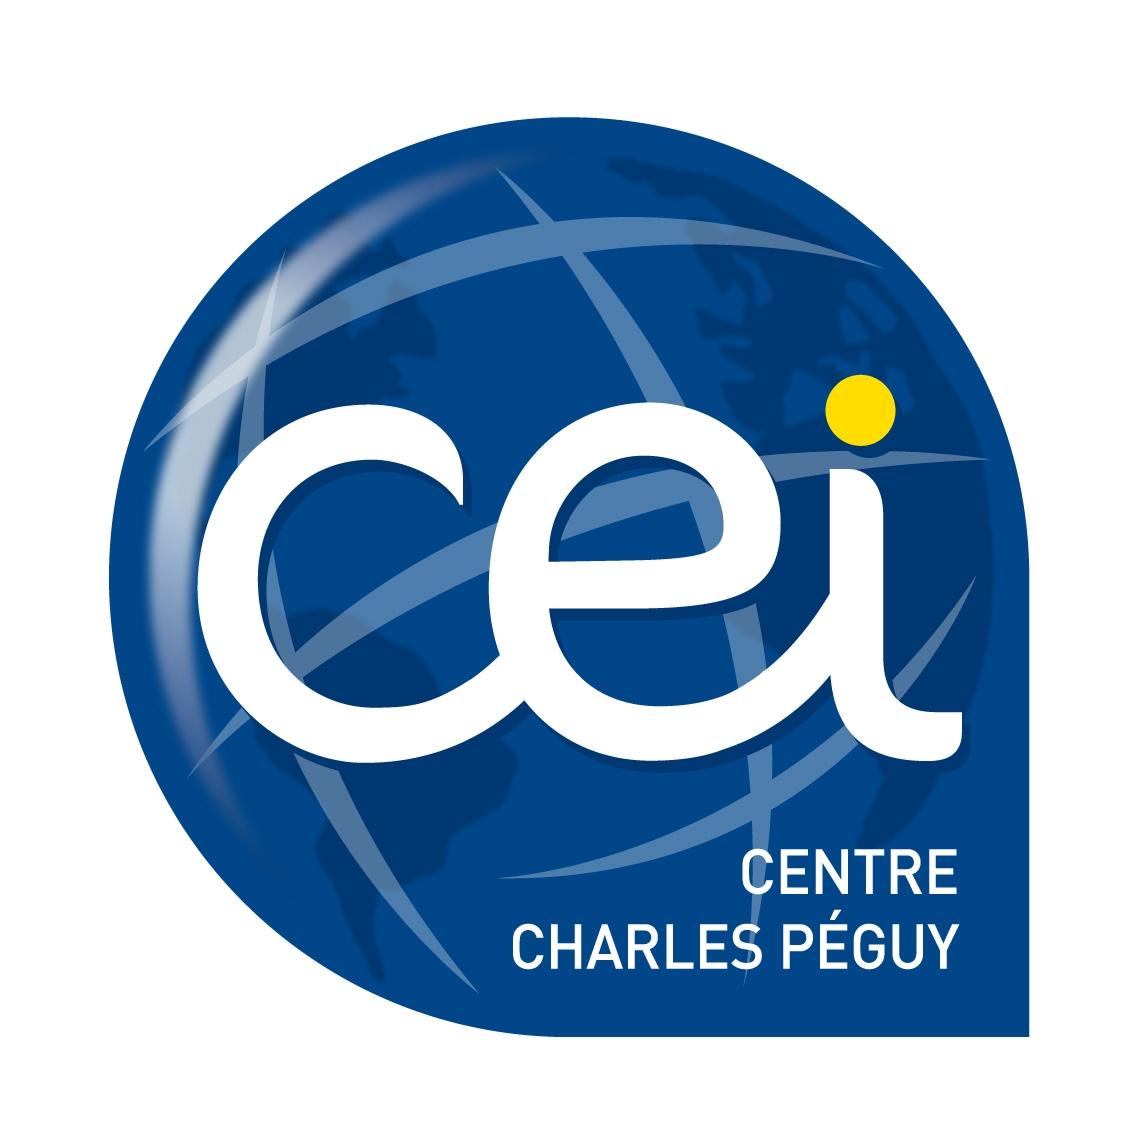 Centre Charles Péguy